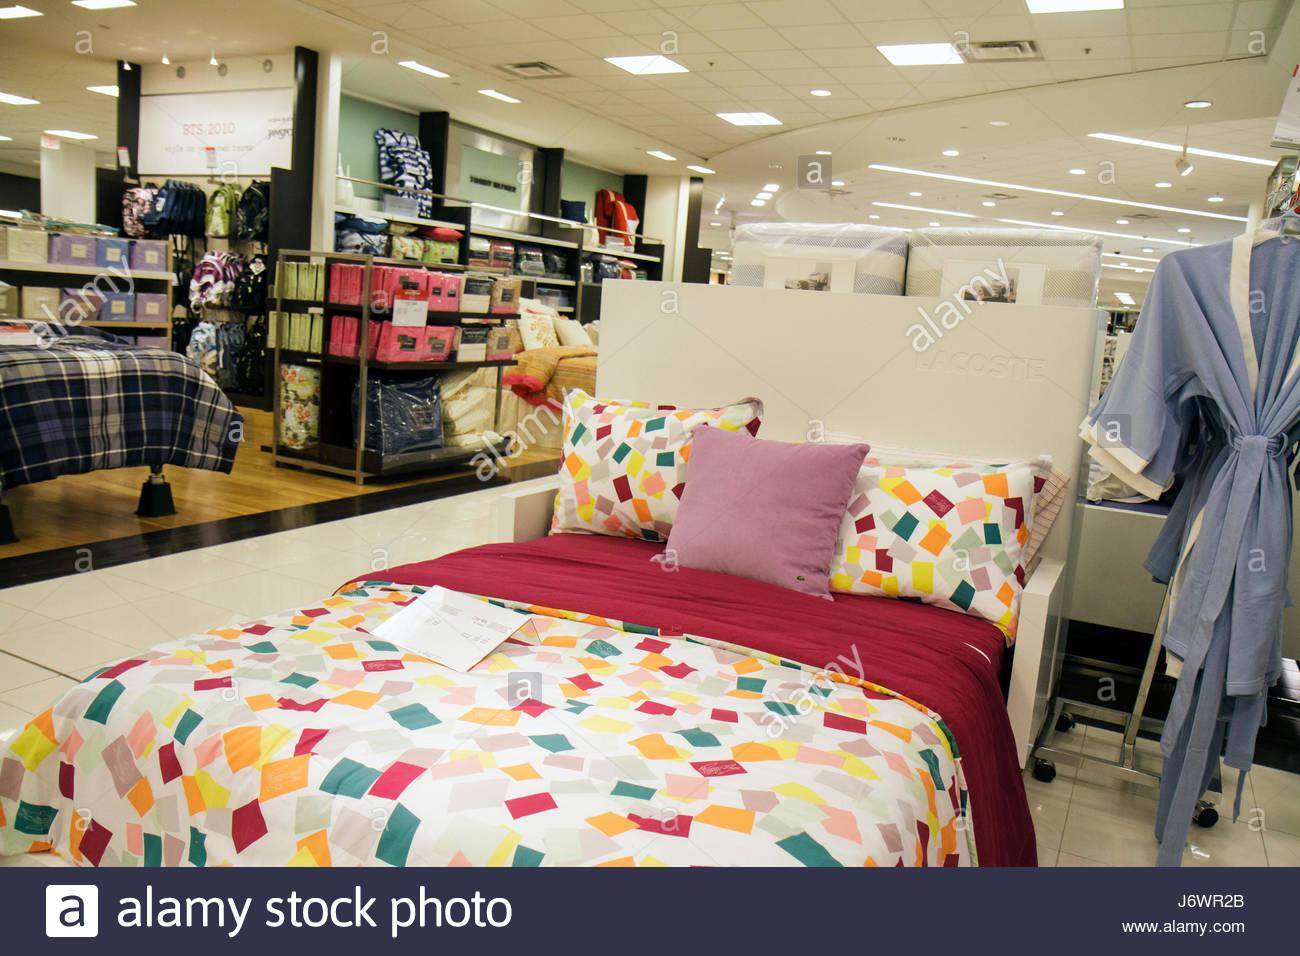 Miami Florida Aventura Aventura Mall Macyu0027s Department Store Shopping  Retail Display For Sale Home Furnishings